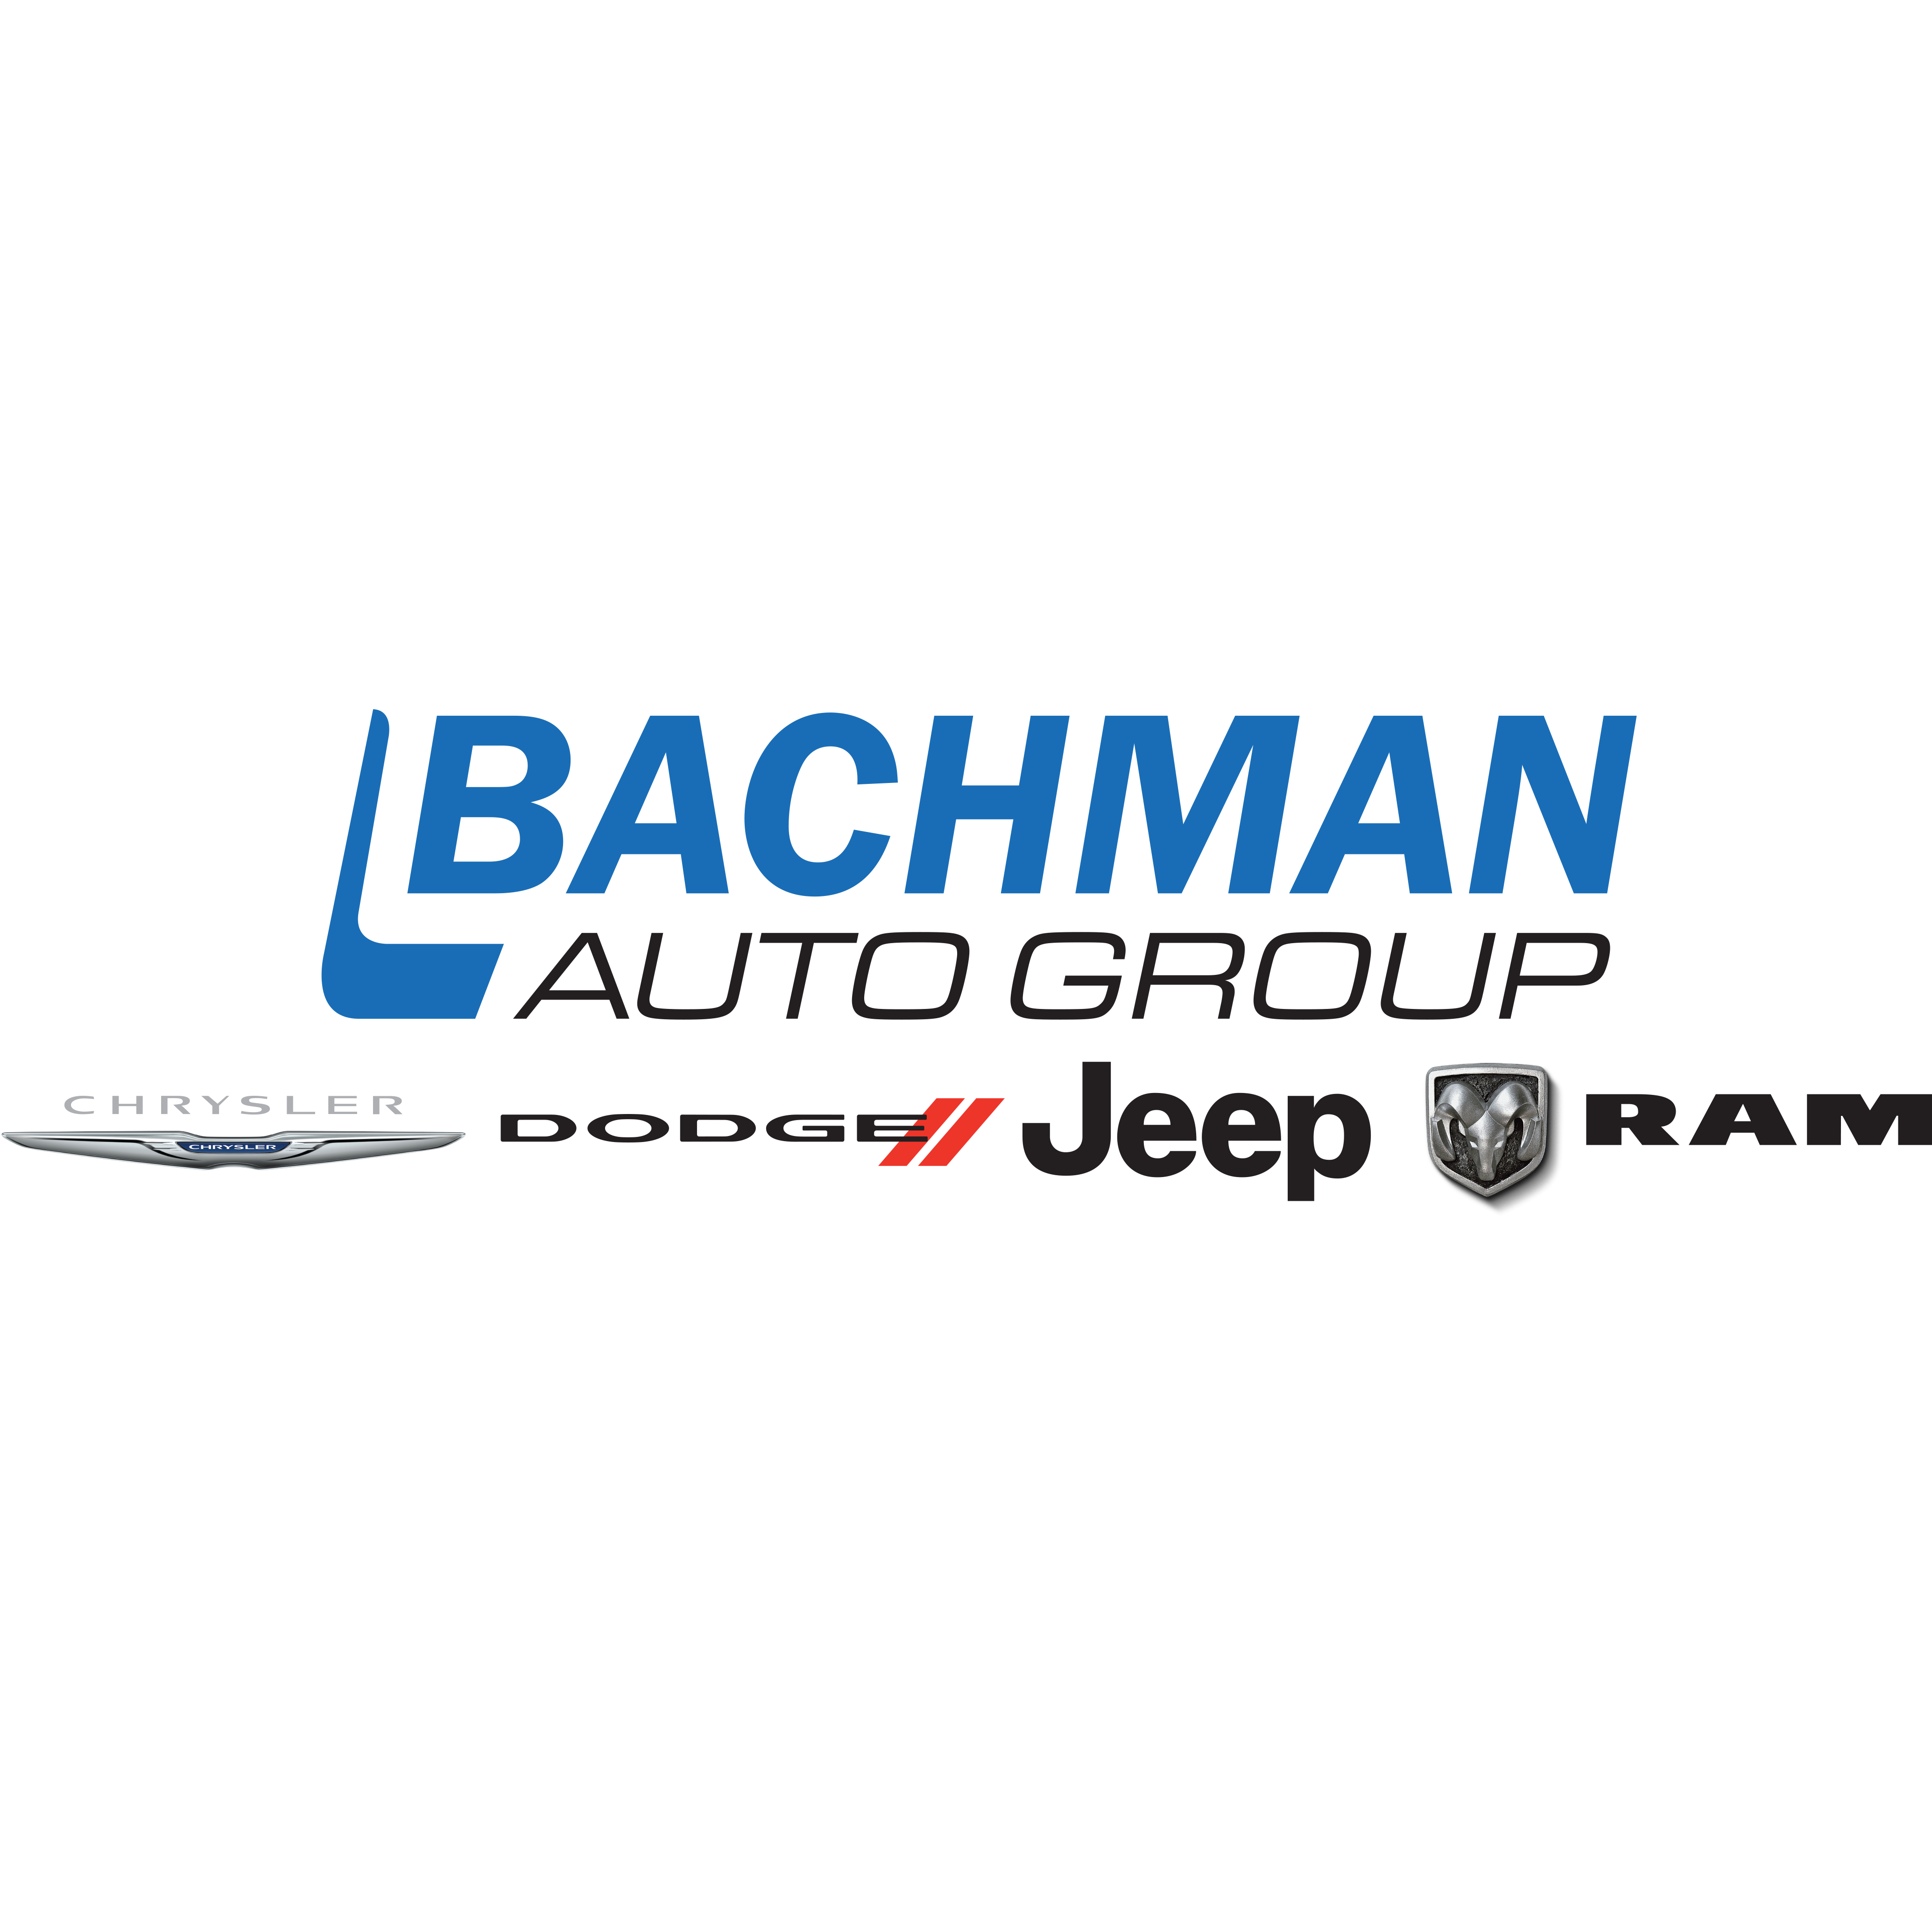 Bachman Chrysler Dodge Jeep Ram